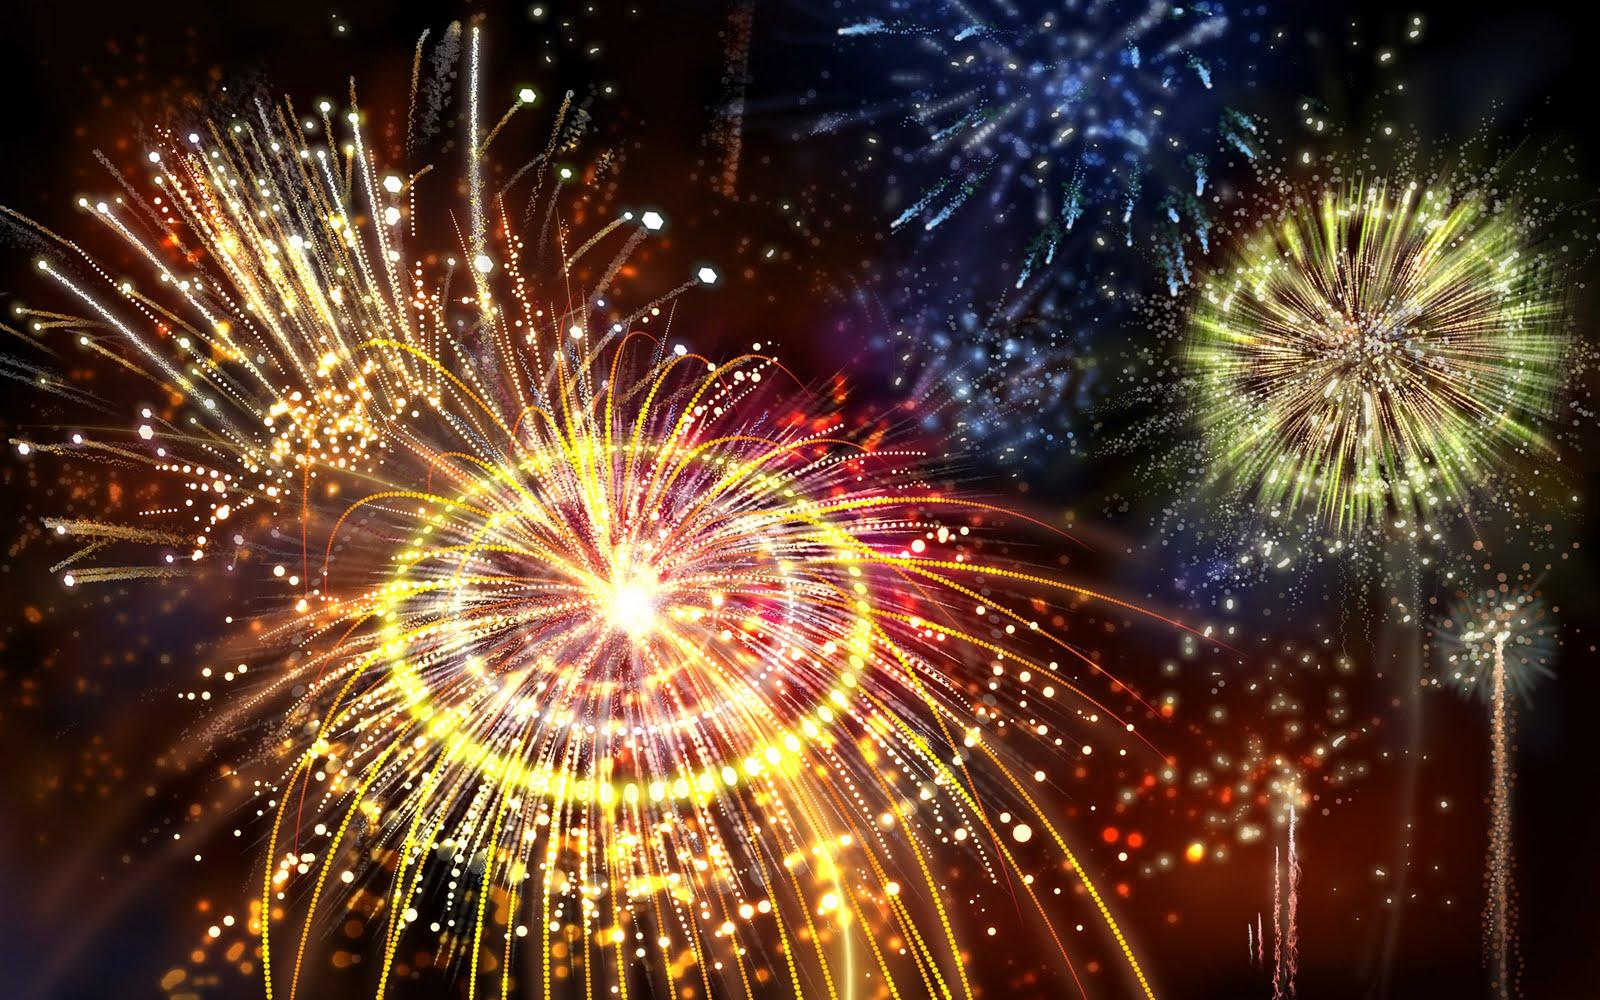 Fireworks Wallpaper WidescreenDisney WallpaperBlue WallpaperAnimated WallpaperFireworks White Background